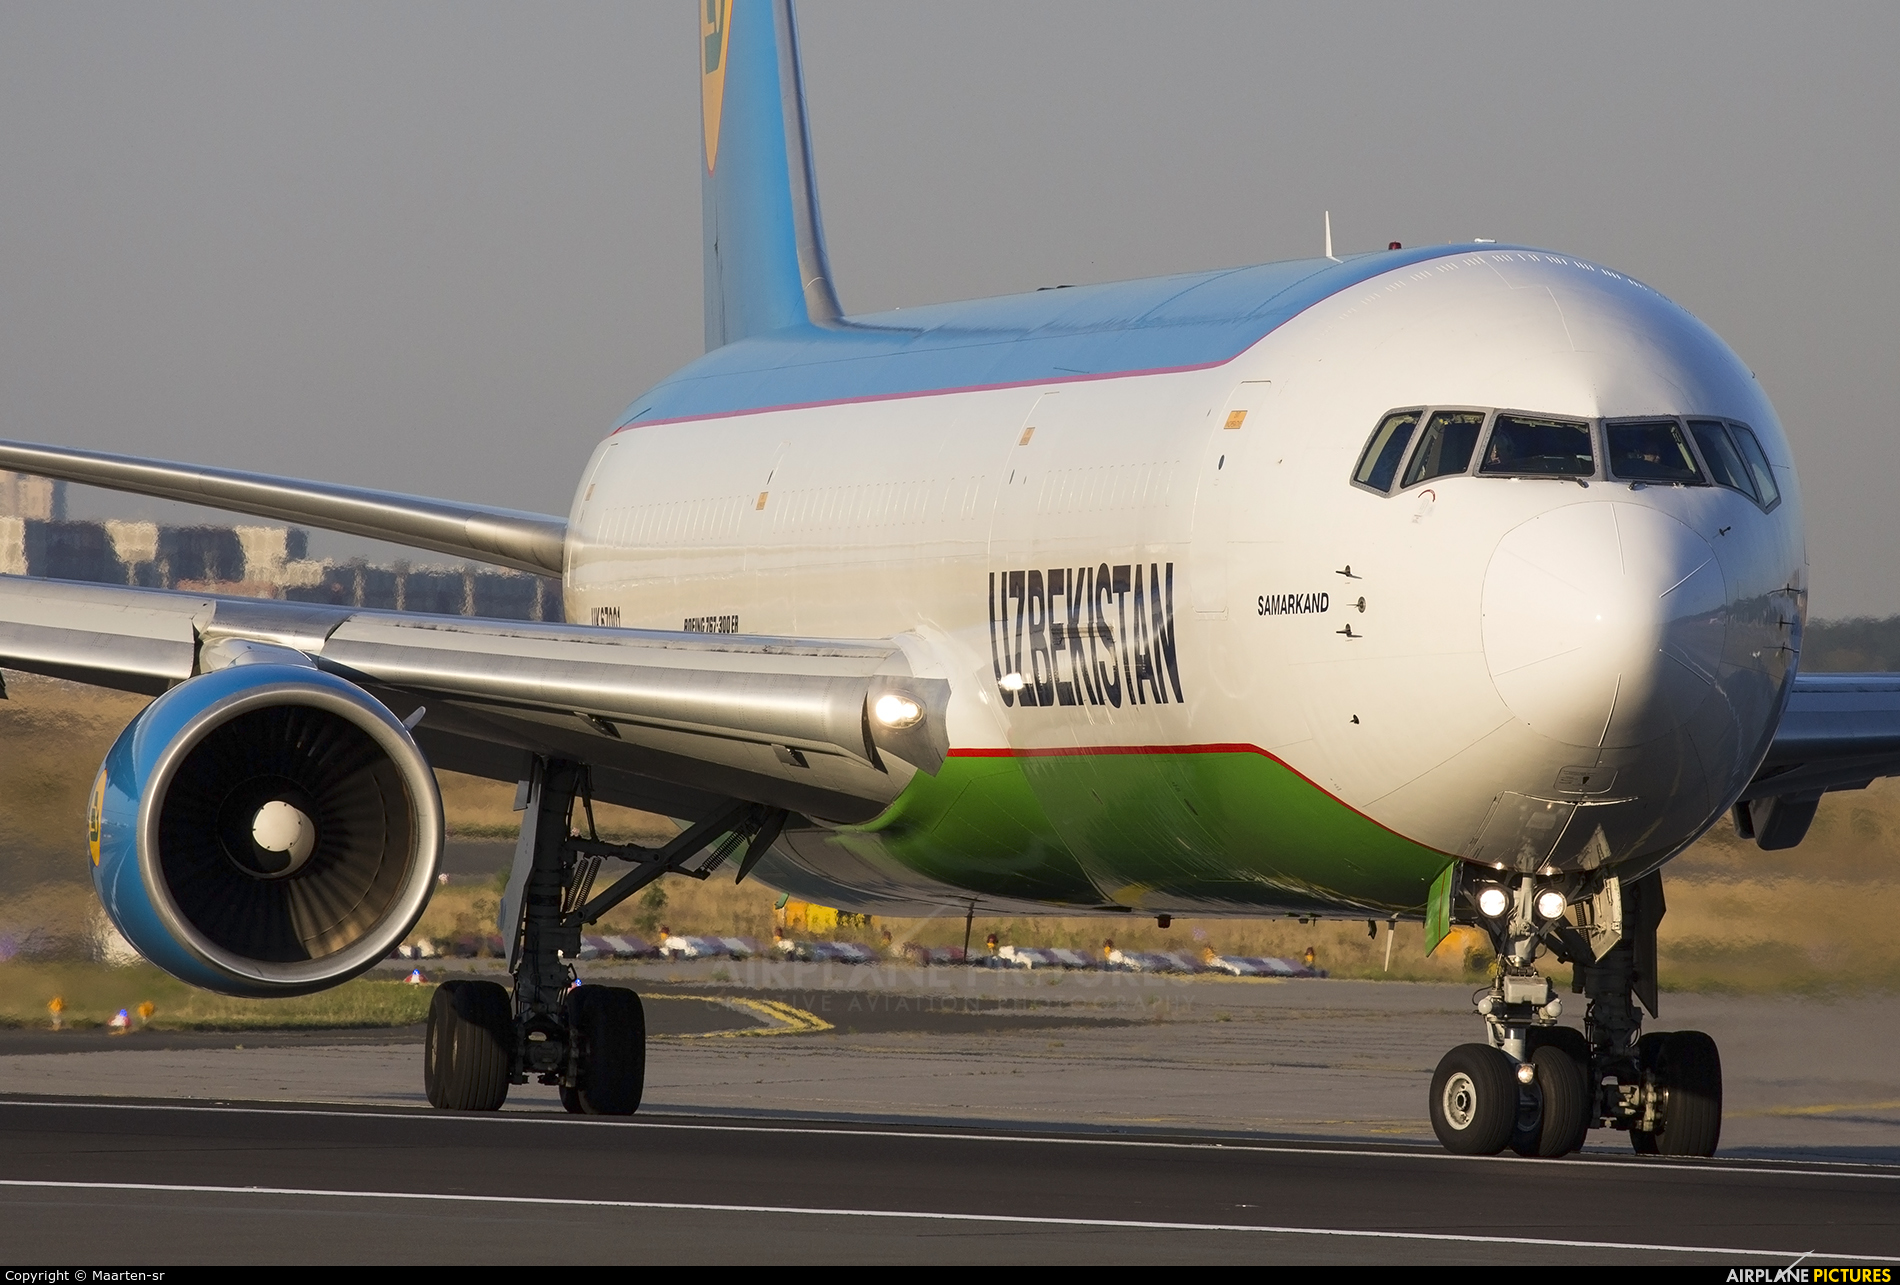 Uzbekistan Airways UK67001 aircraft at Frankfurt